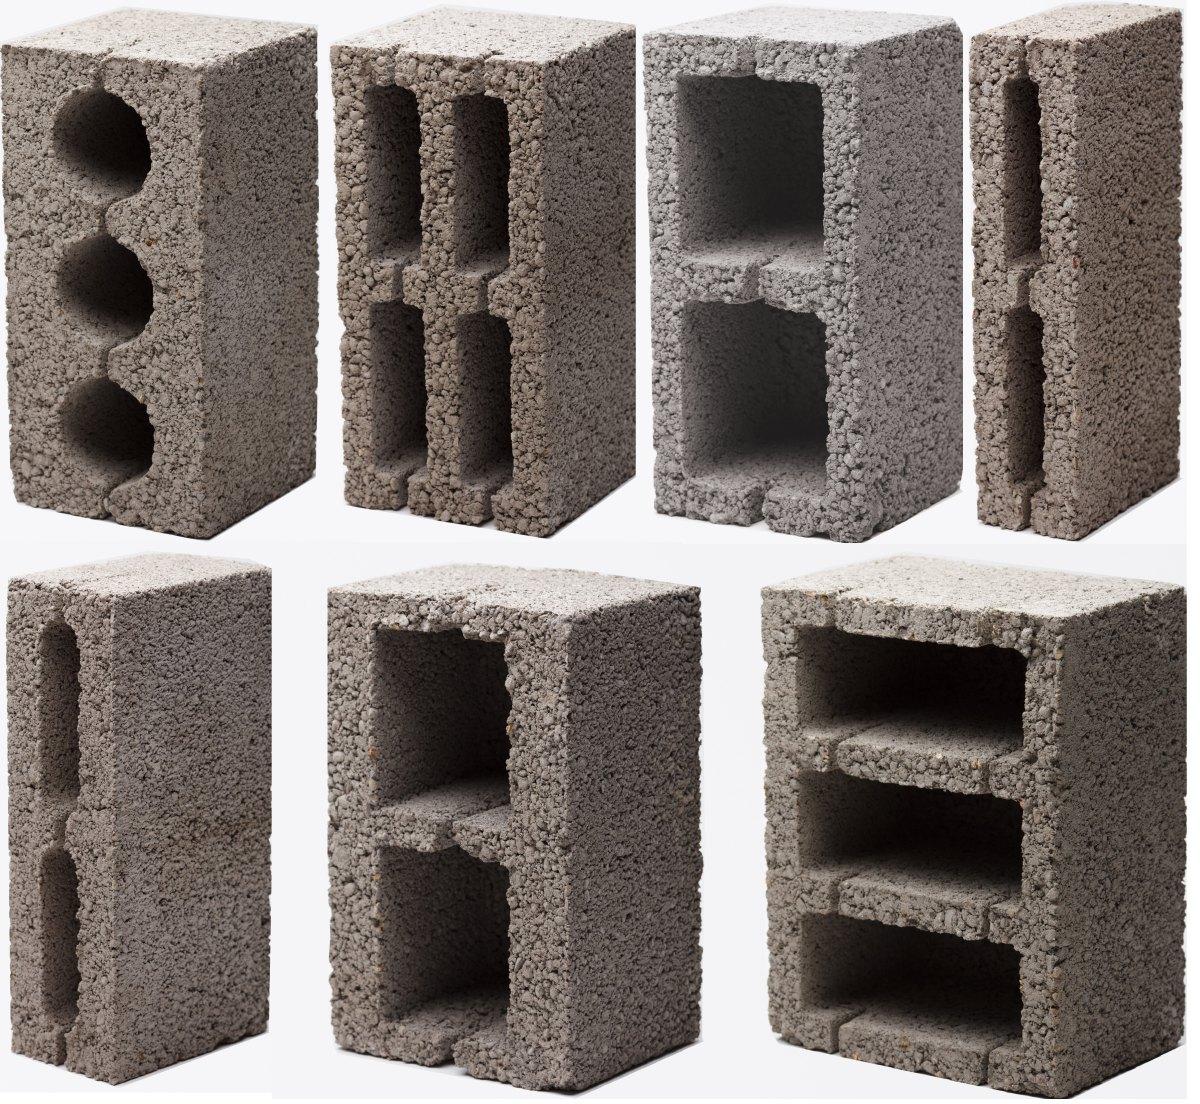 Керамзитобетон м200 вес 1 м3 миксер бетон купить